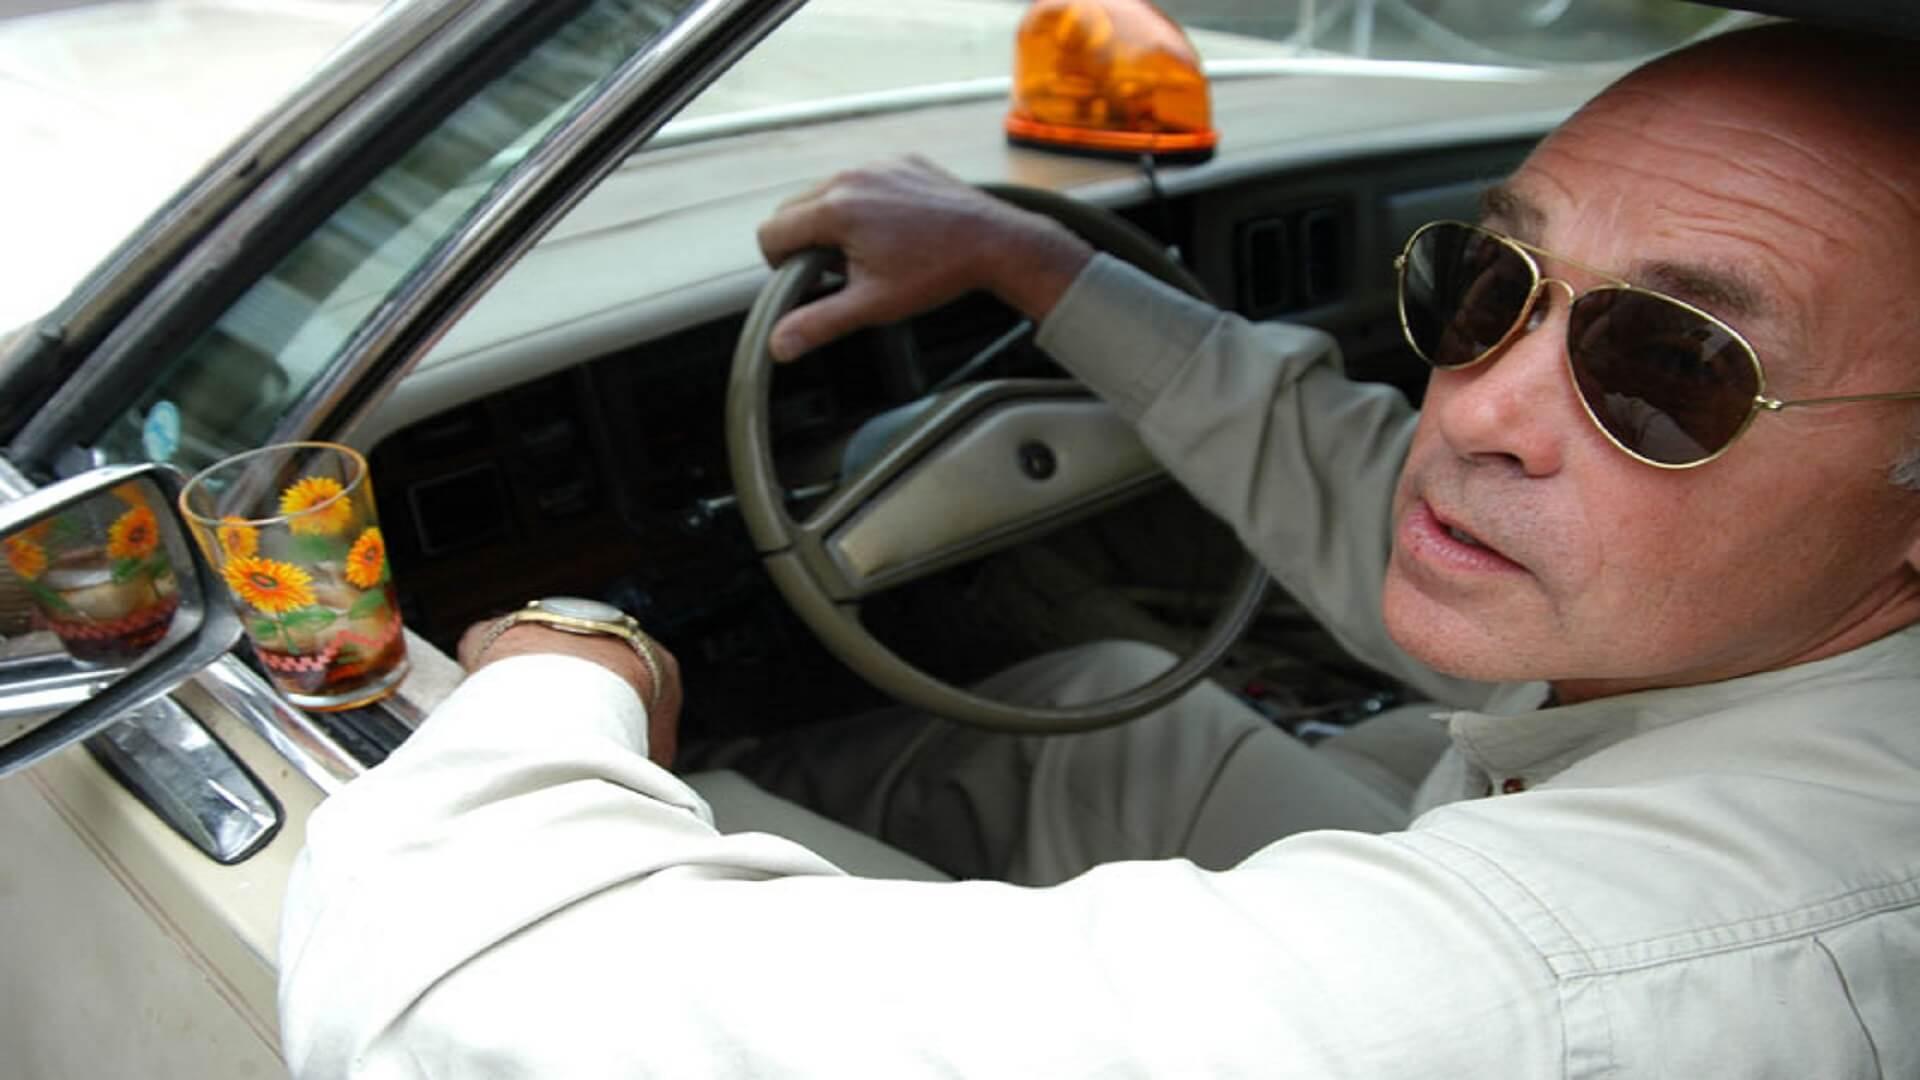 Trailer Park Boys Mr. Lahey Actor Dies at 71